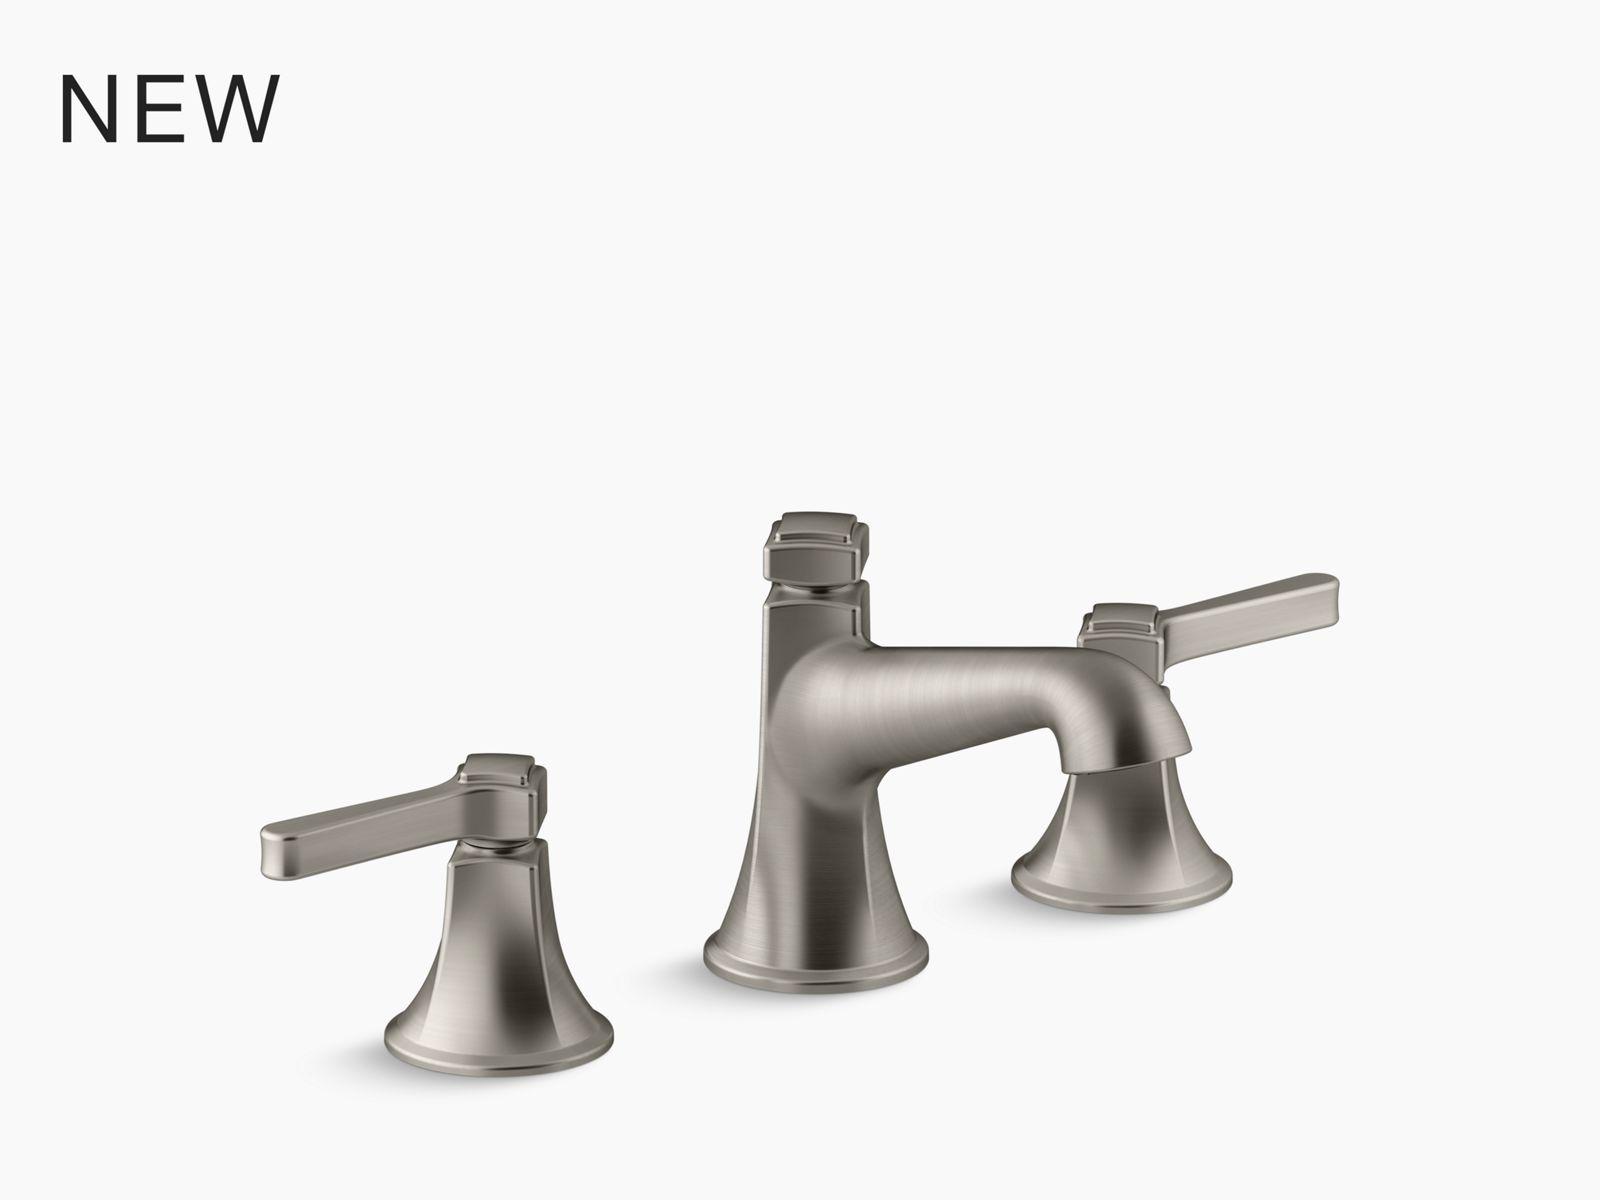 tempered single handle bathroom sink faucet